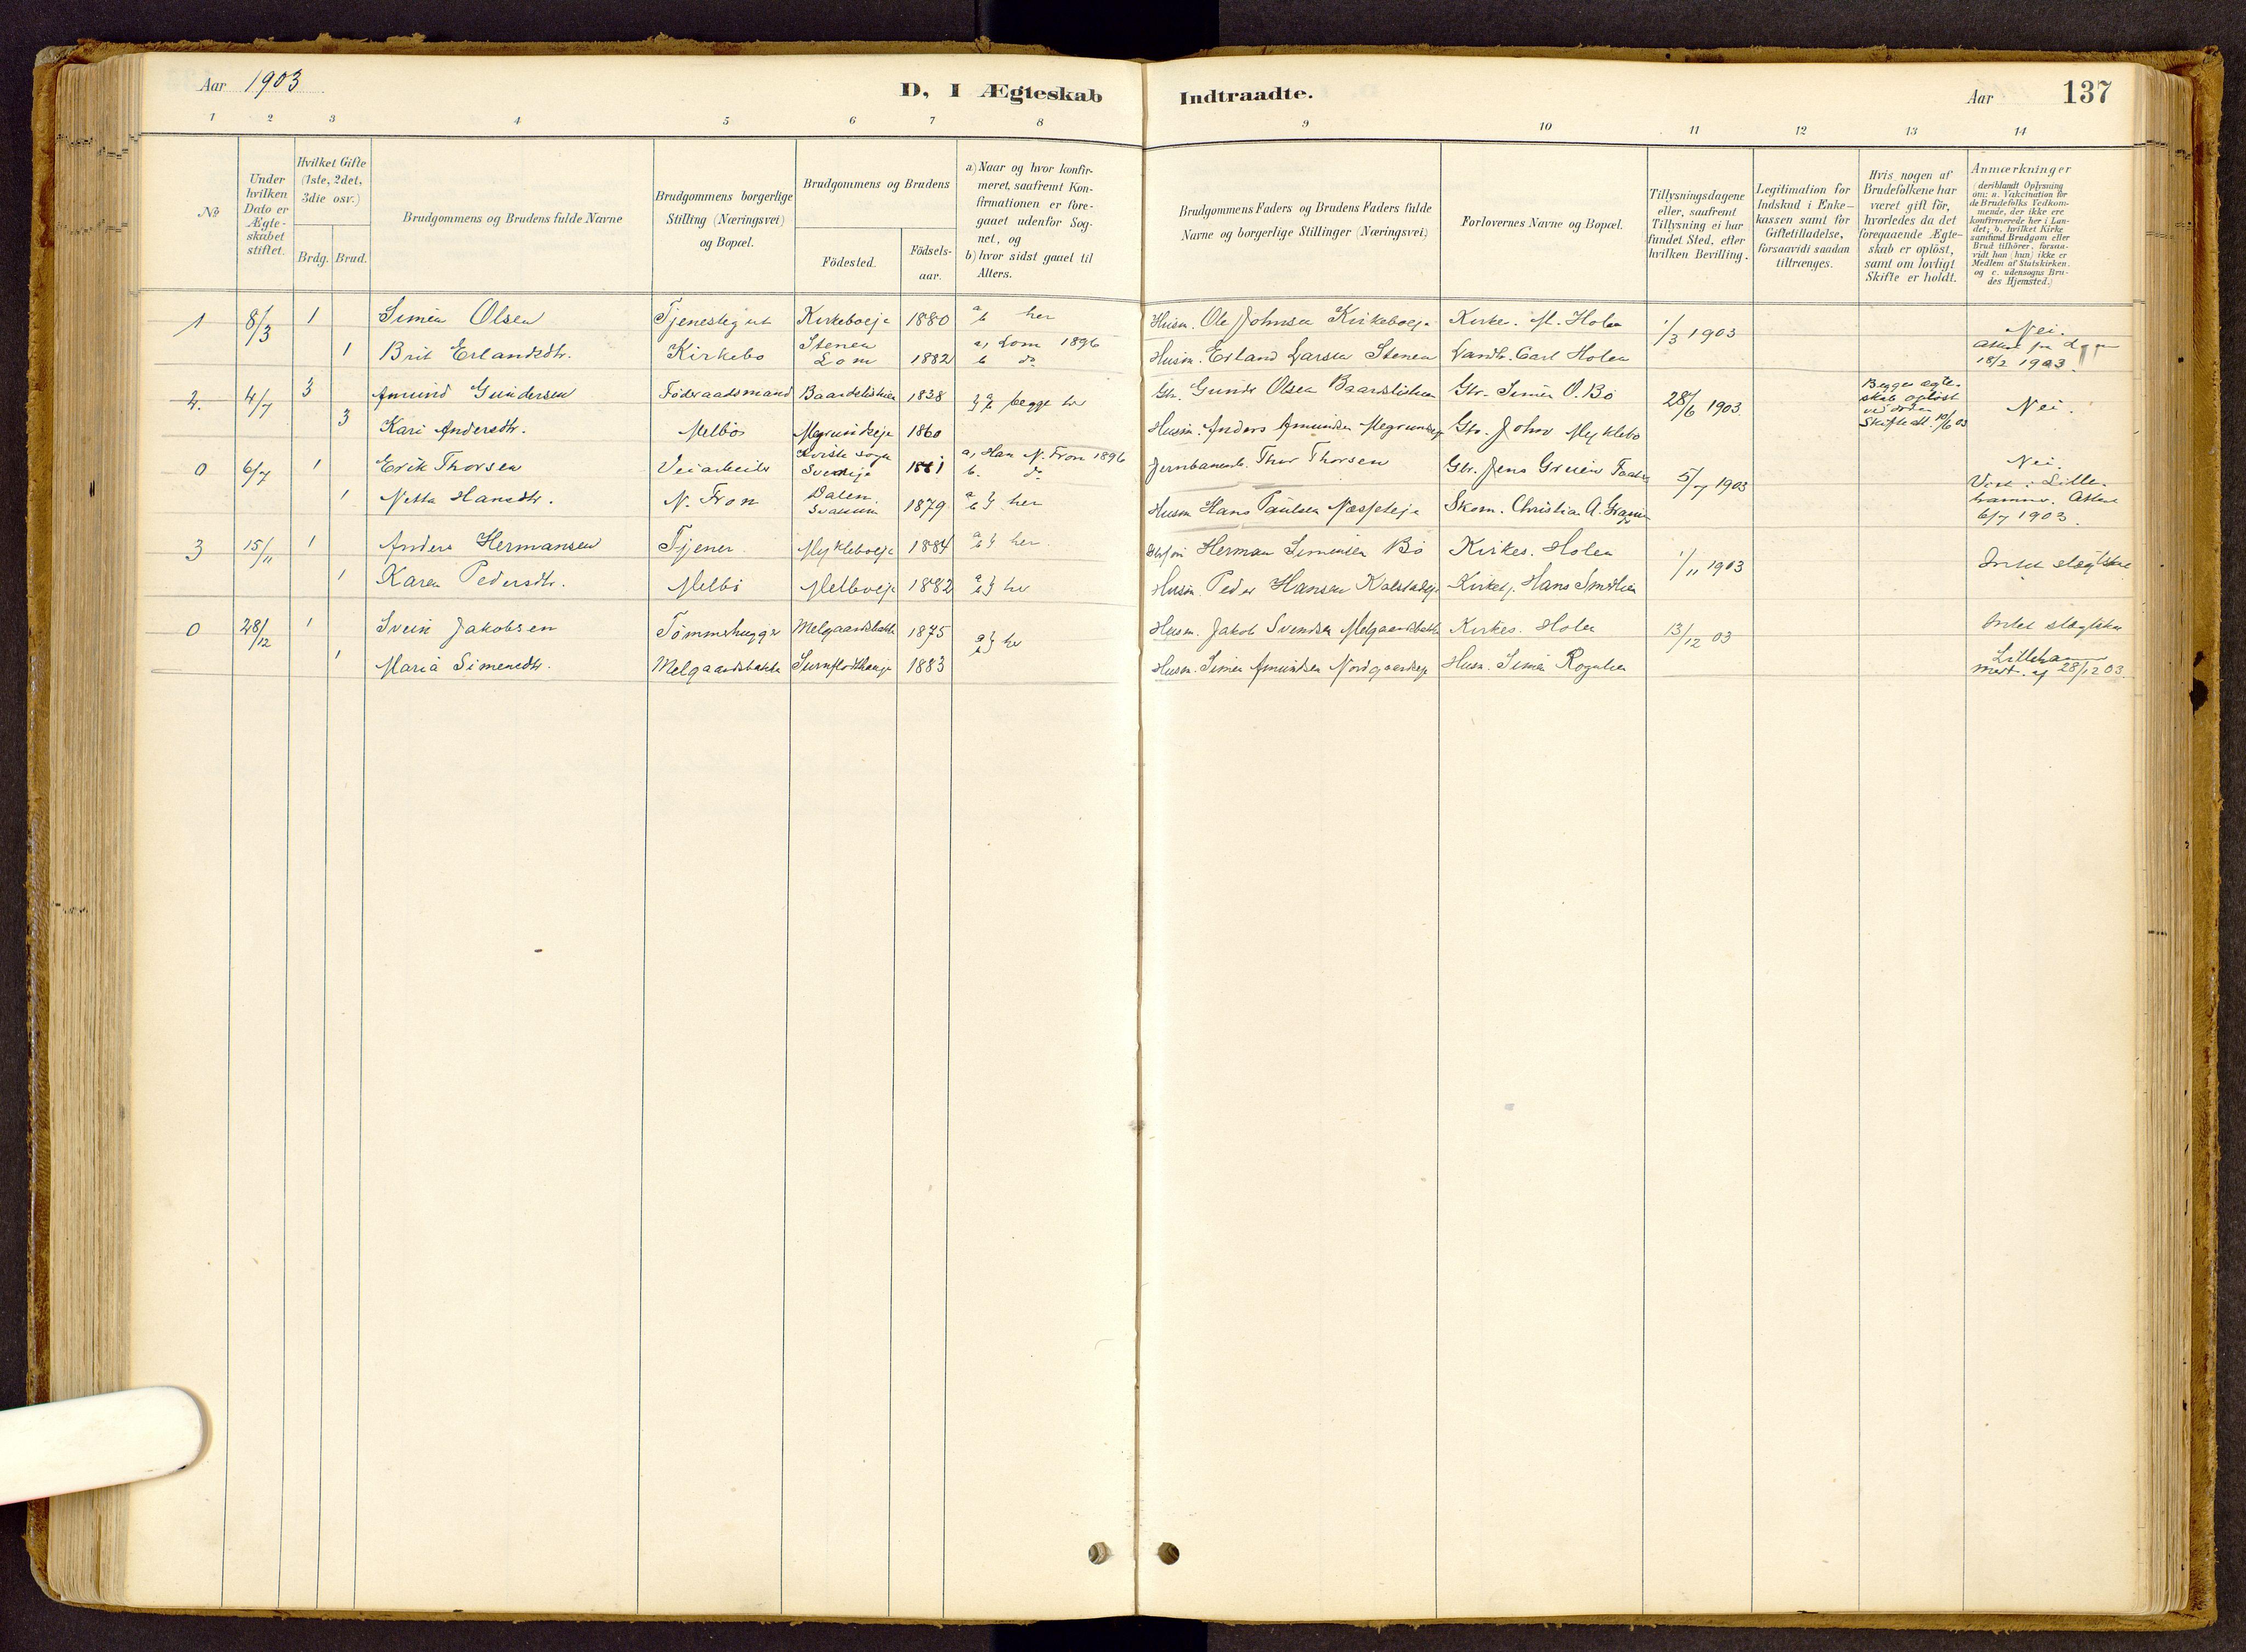 SAH, Vestre Gausdal prestekontor, Ministerialbok nr. 2, 1887-1918, s. 137